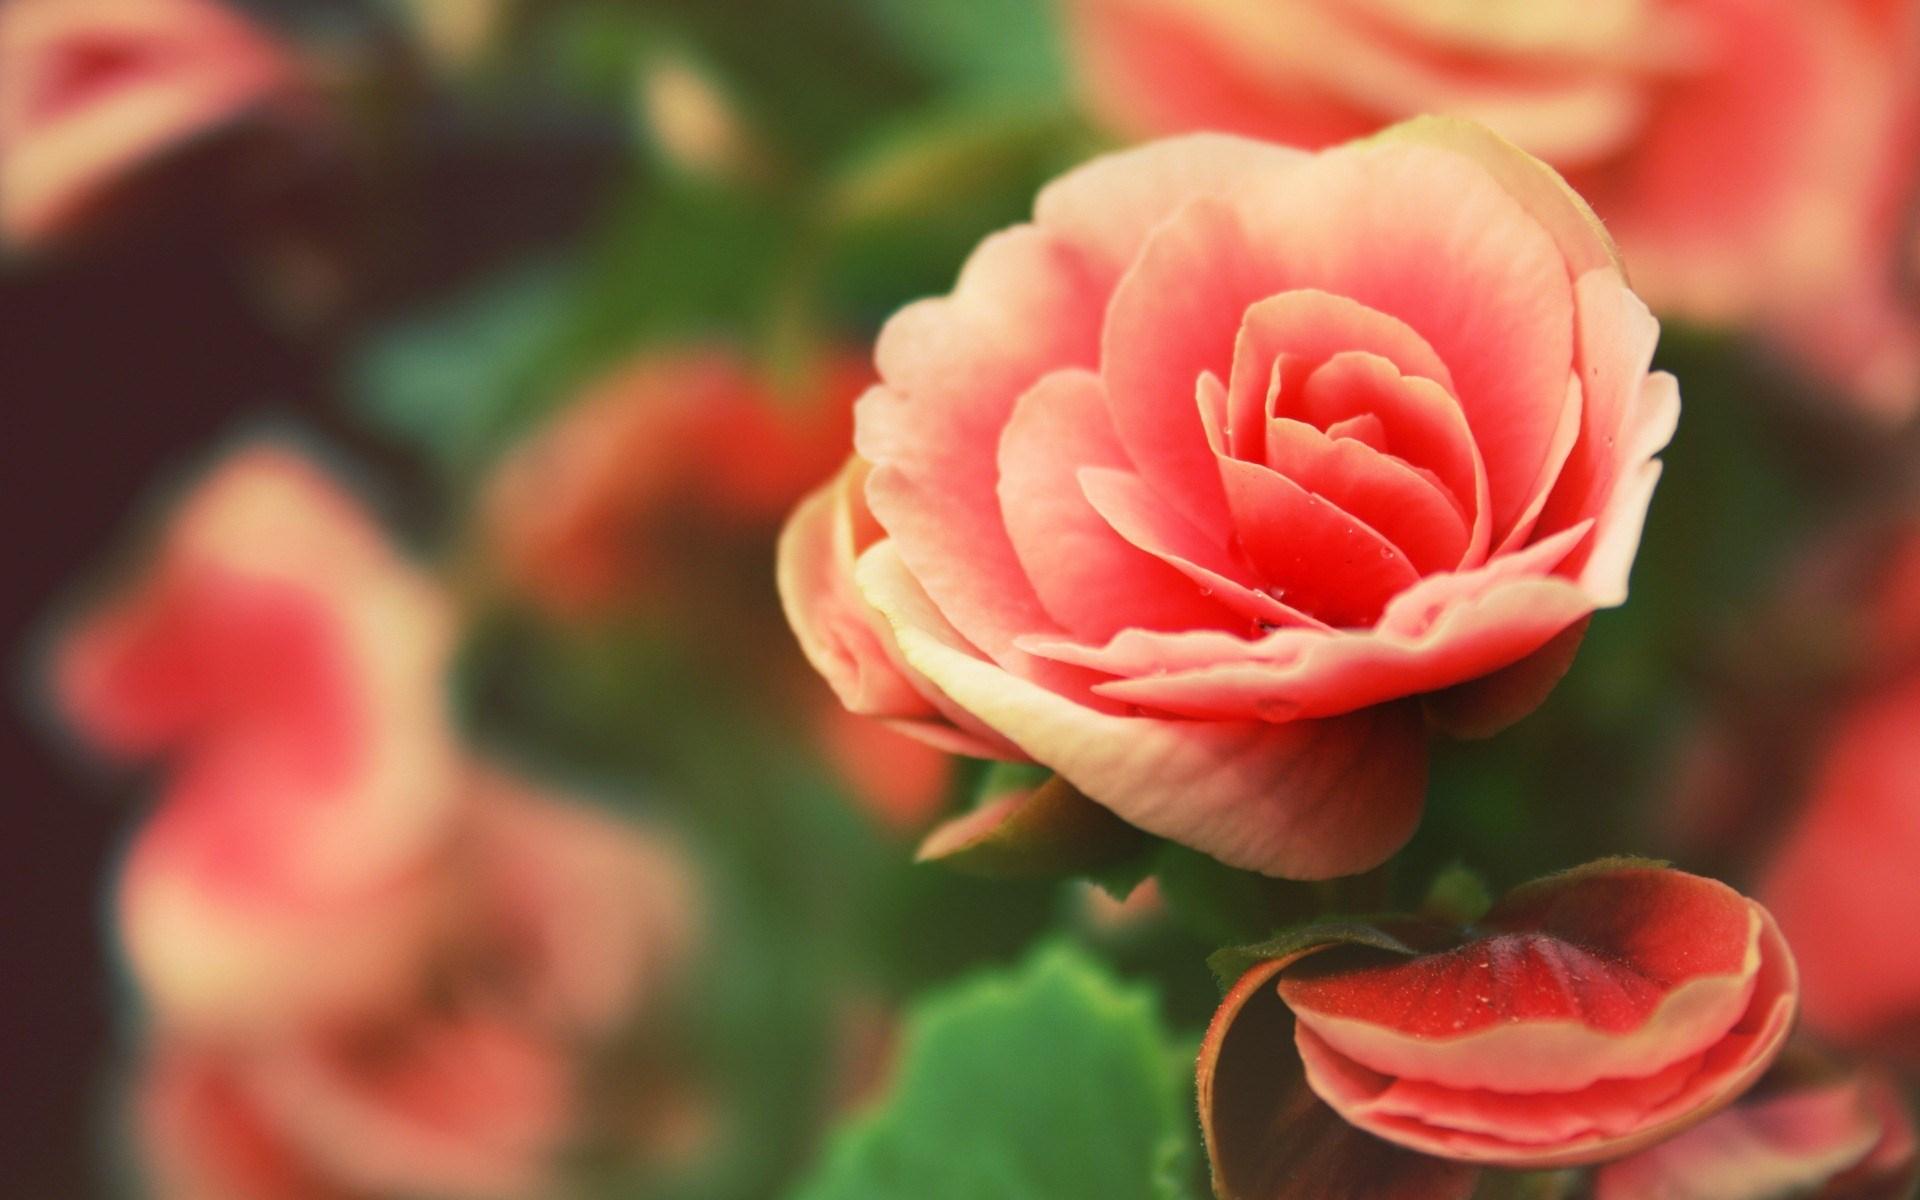 Beautiful Flowers Wallpaper Nature - HD Wallpaper